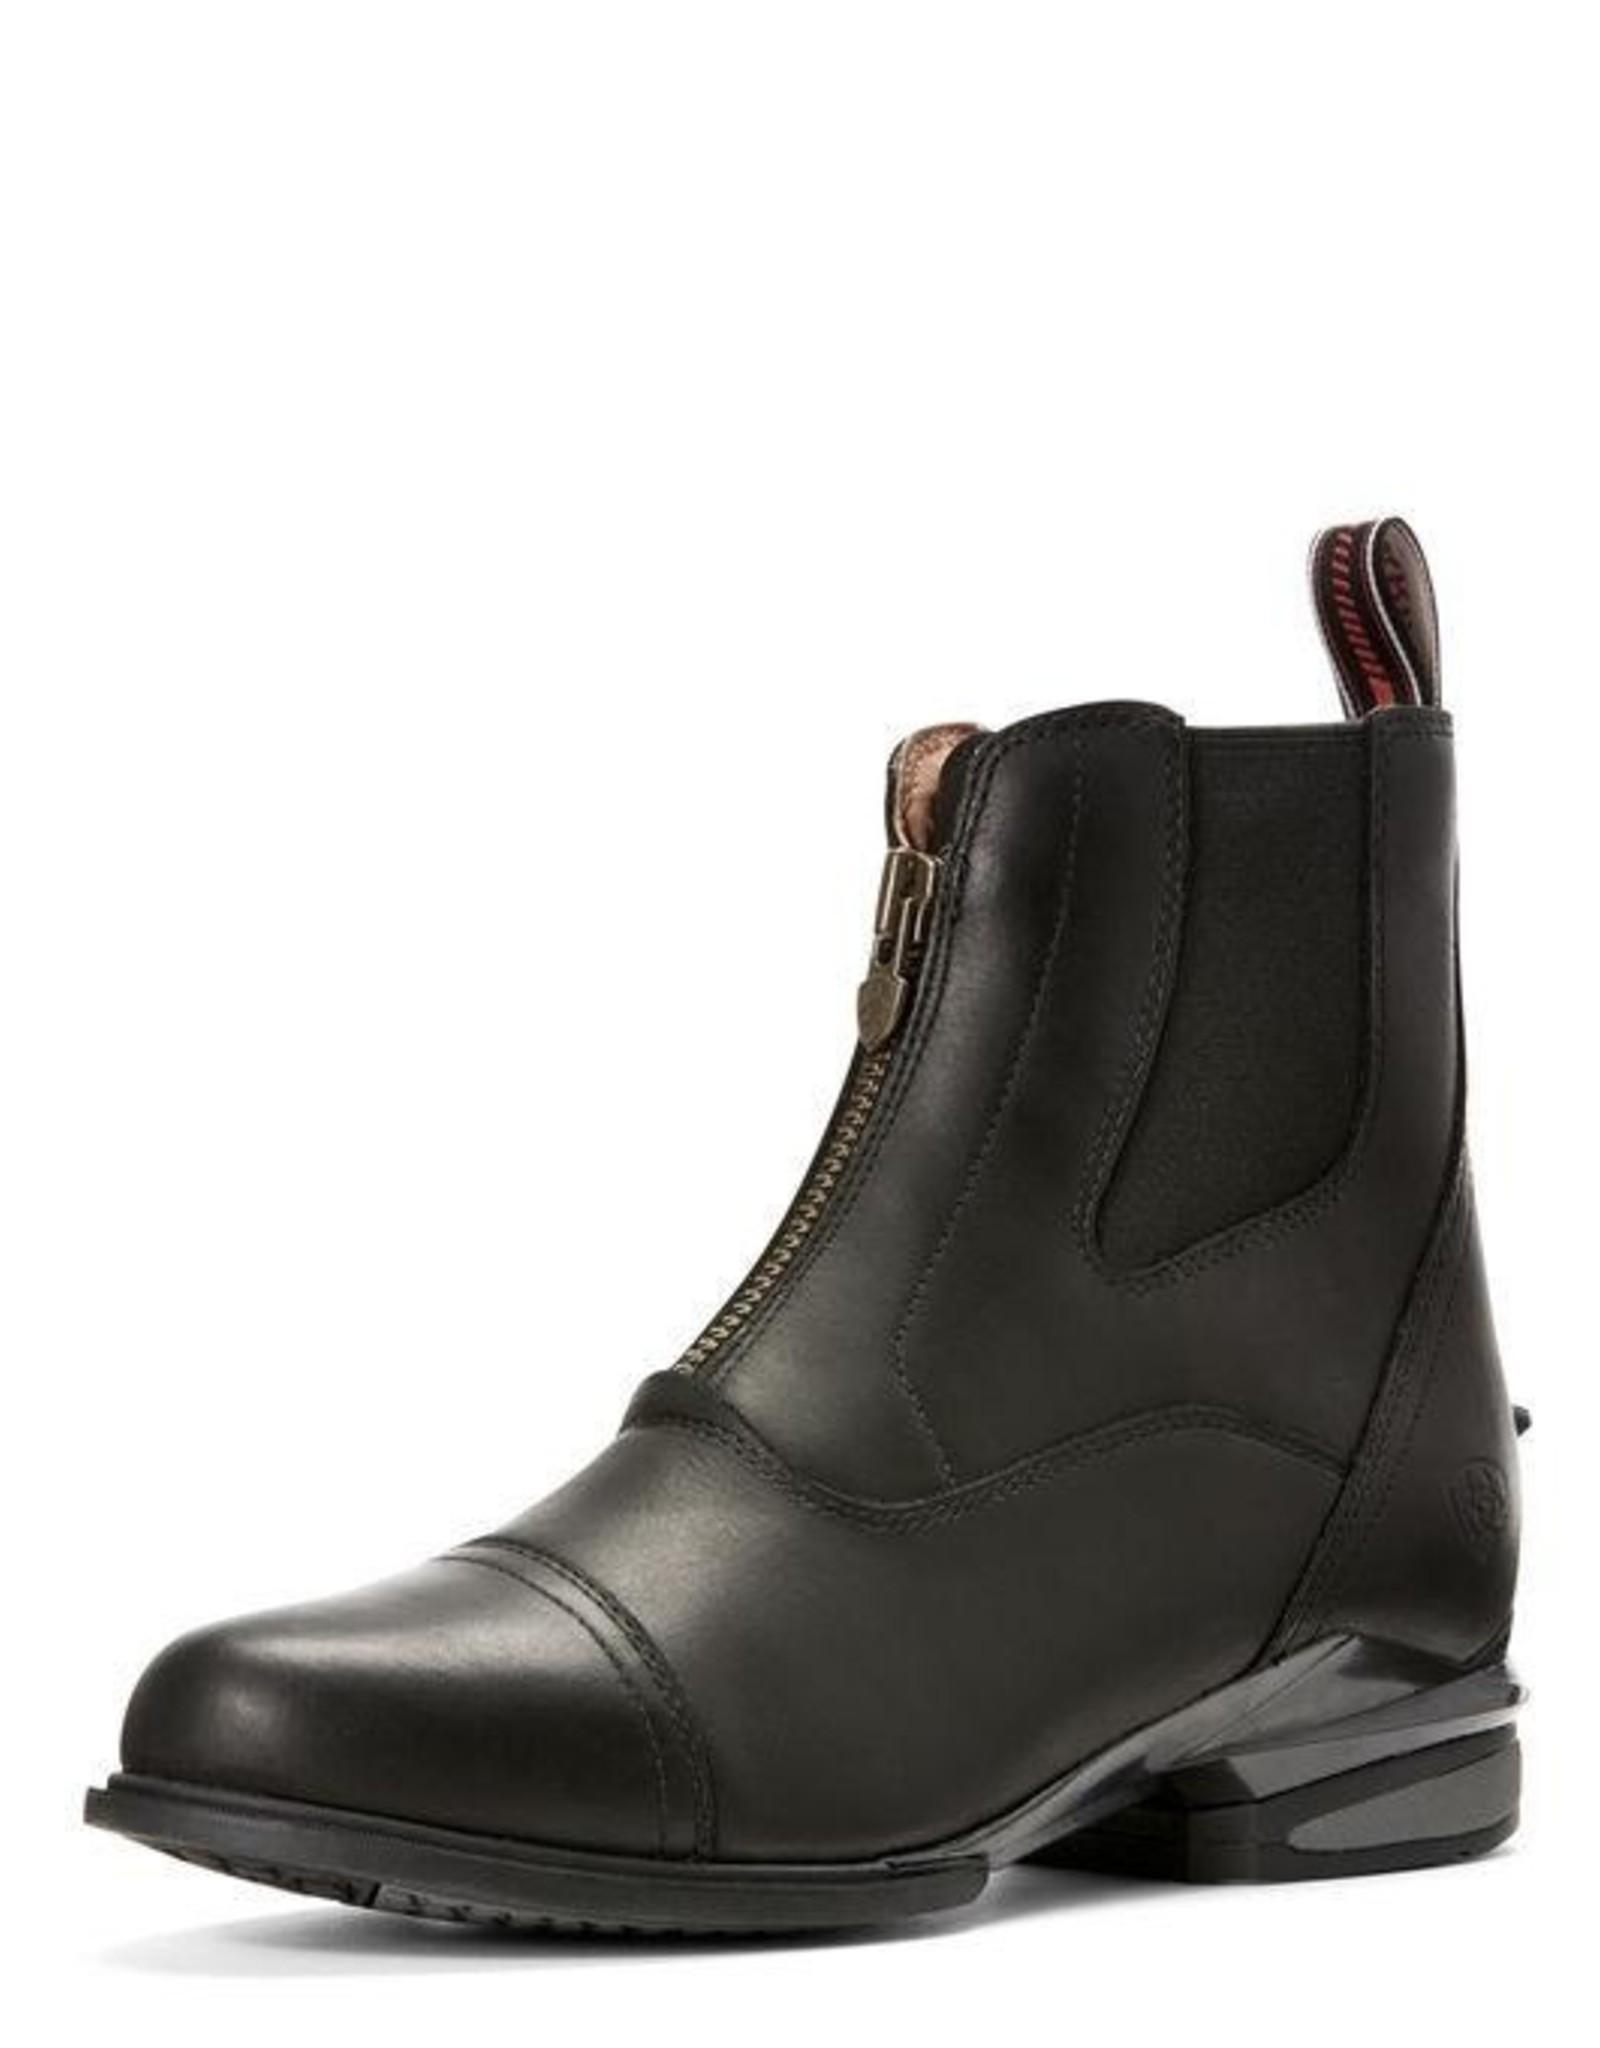 Ariat Ladies Devon Nitro Paddock Boot